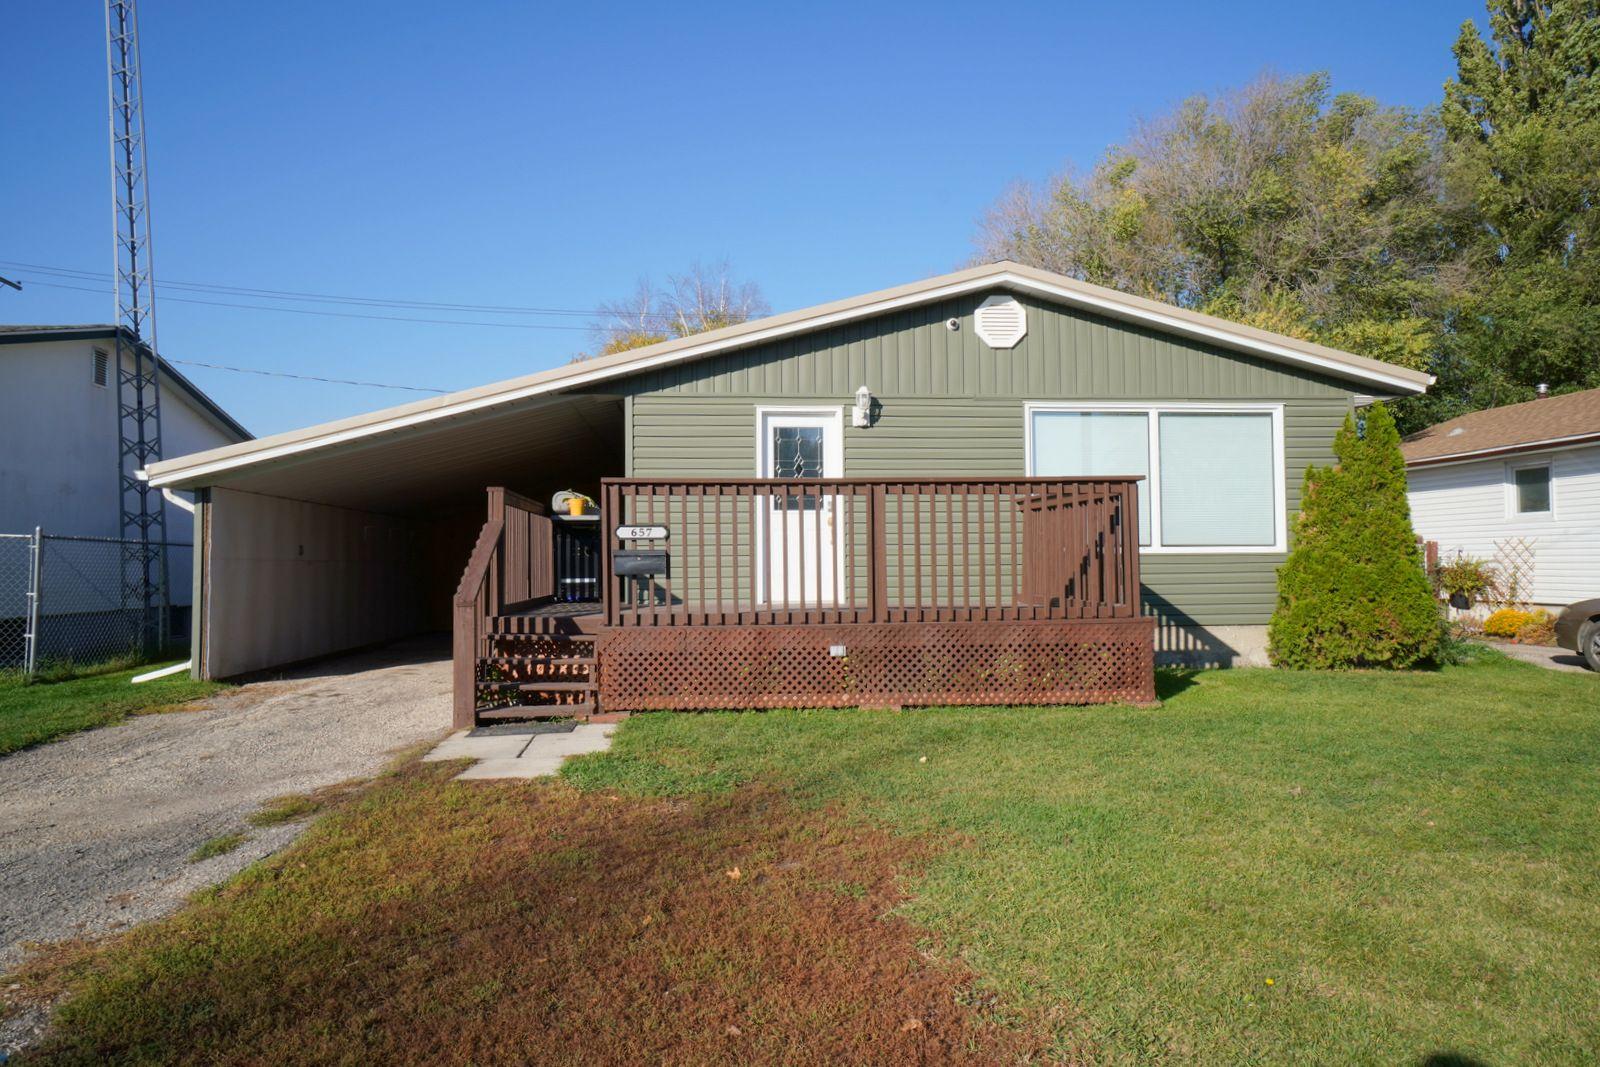 Main Photo: 657 4th St NE in Portage la Prairie: House for sale : MLS®# 202124572